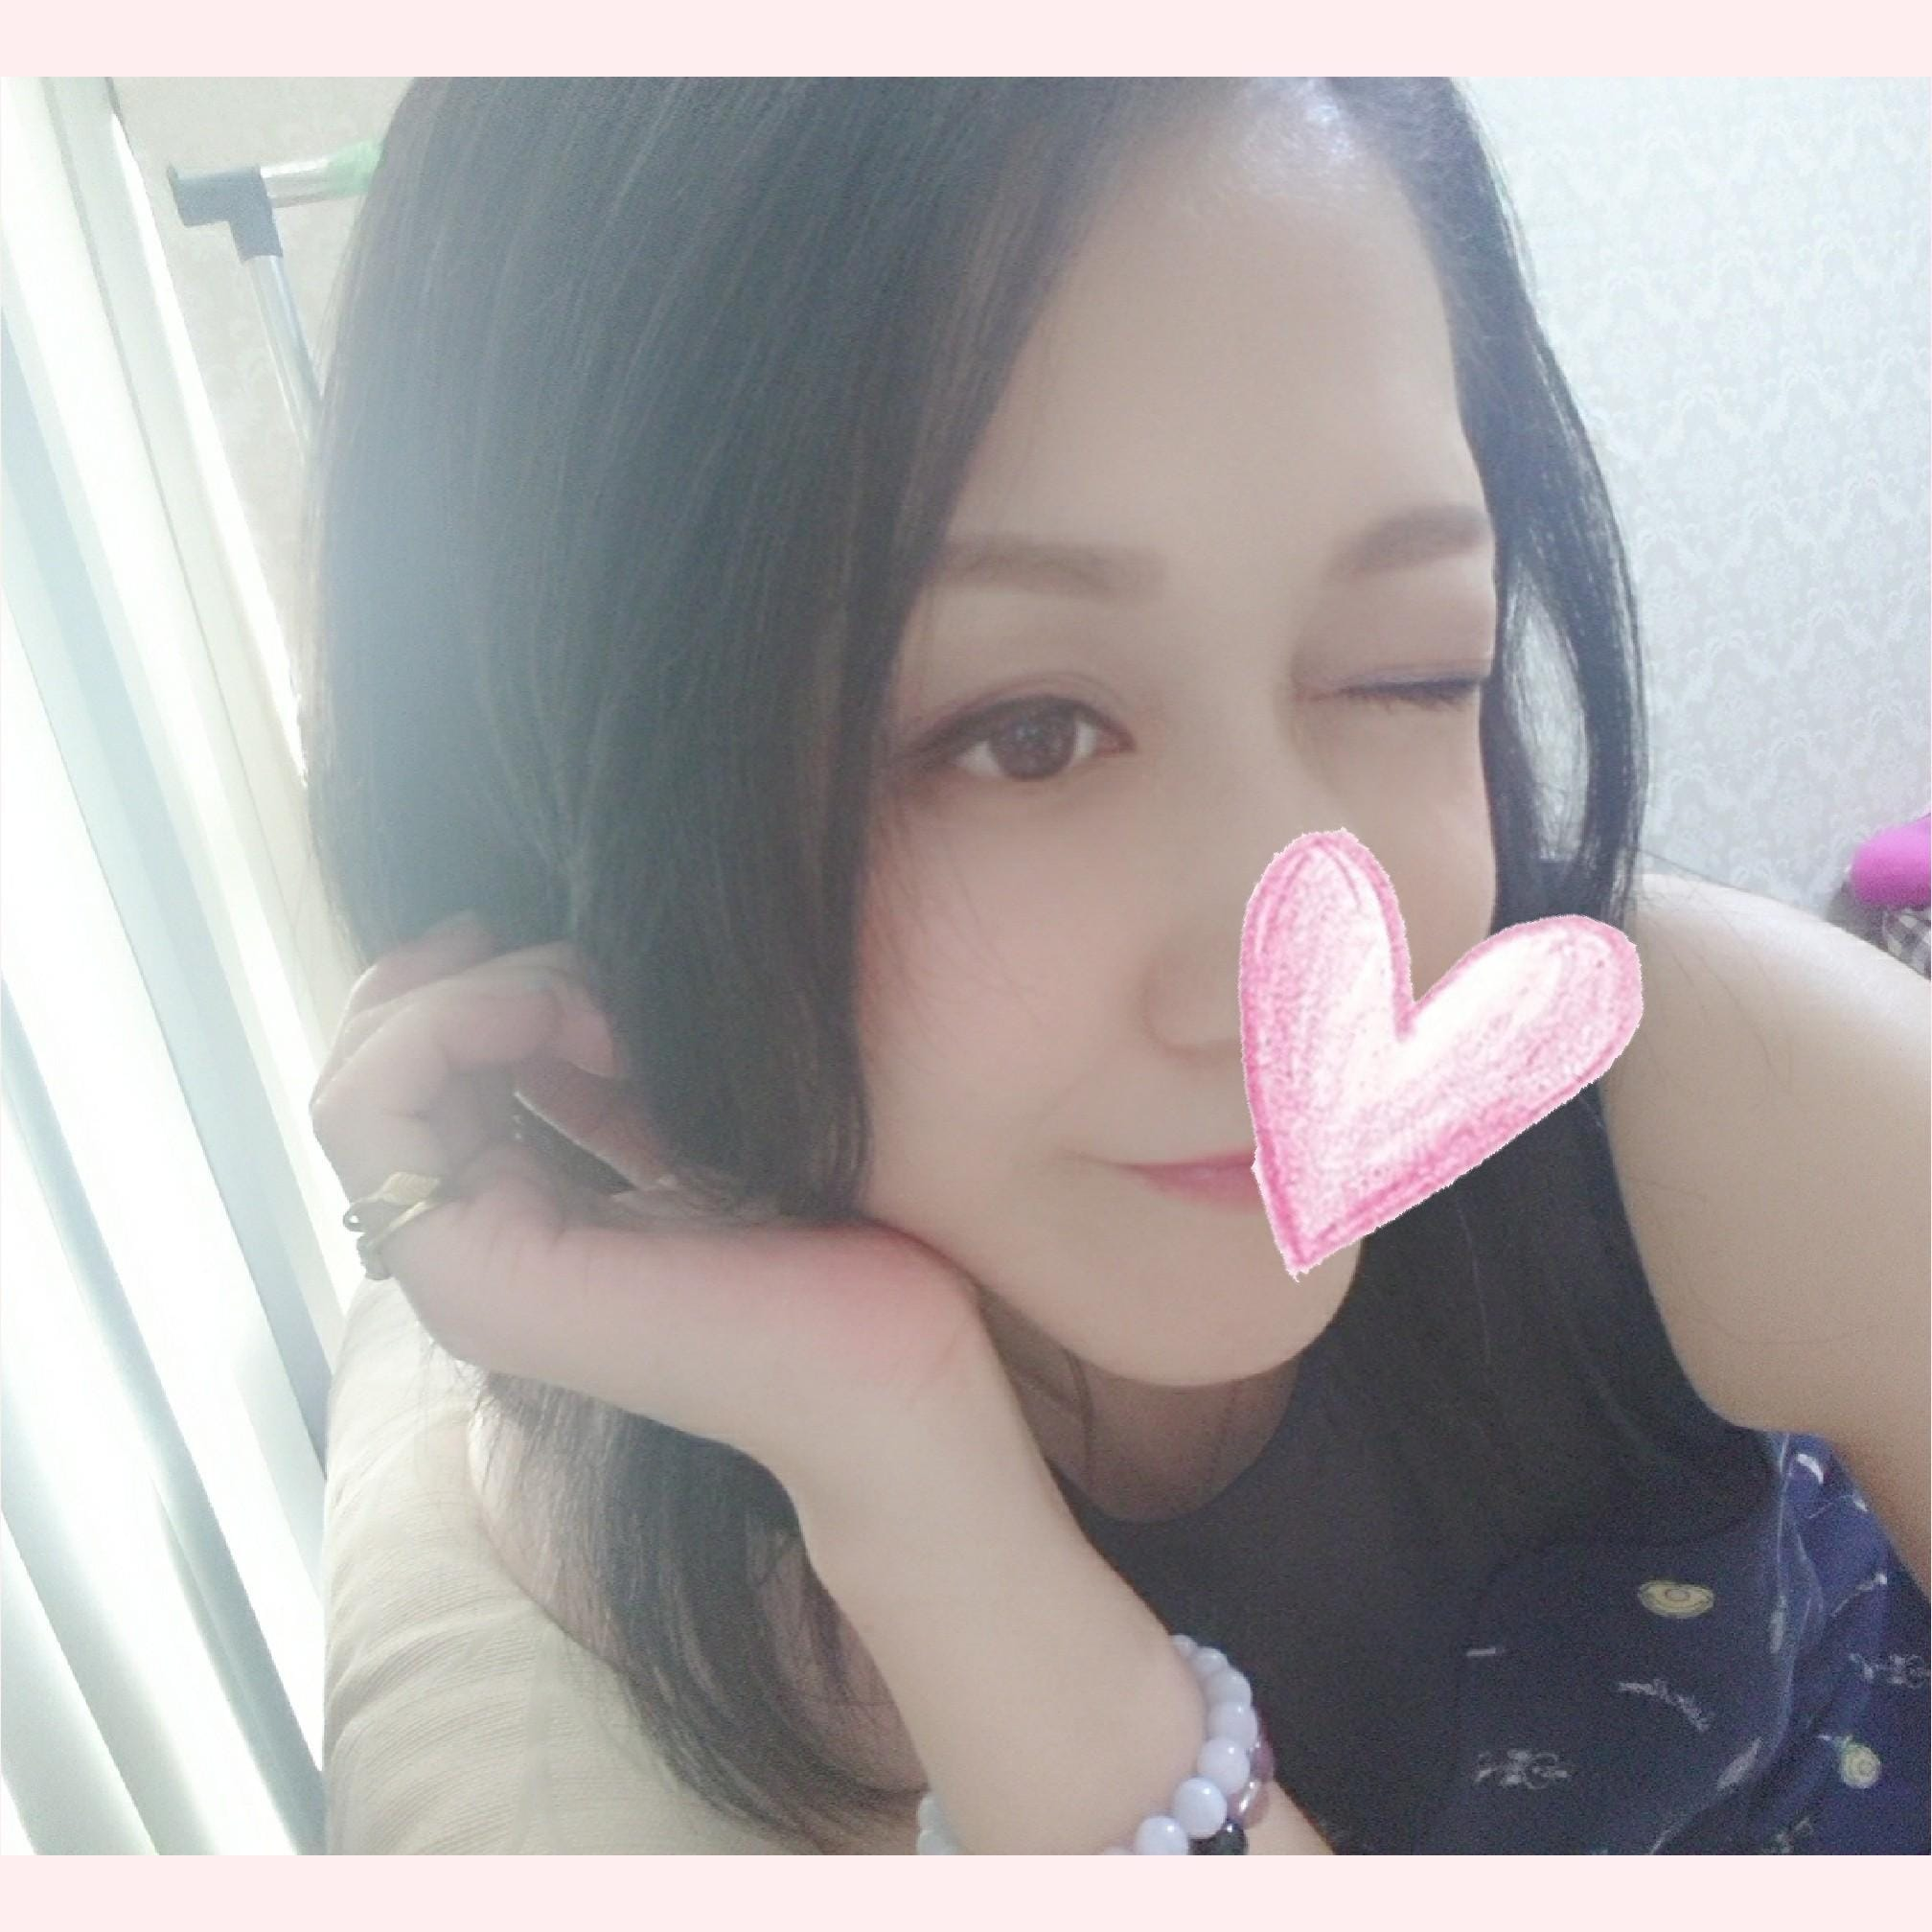 「morning」09/13(金) 09:13 | るなの写メ・風俗動画